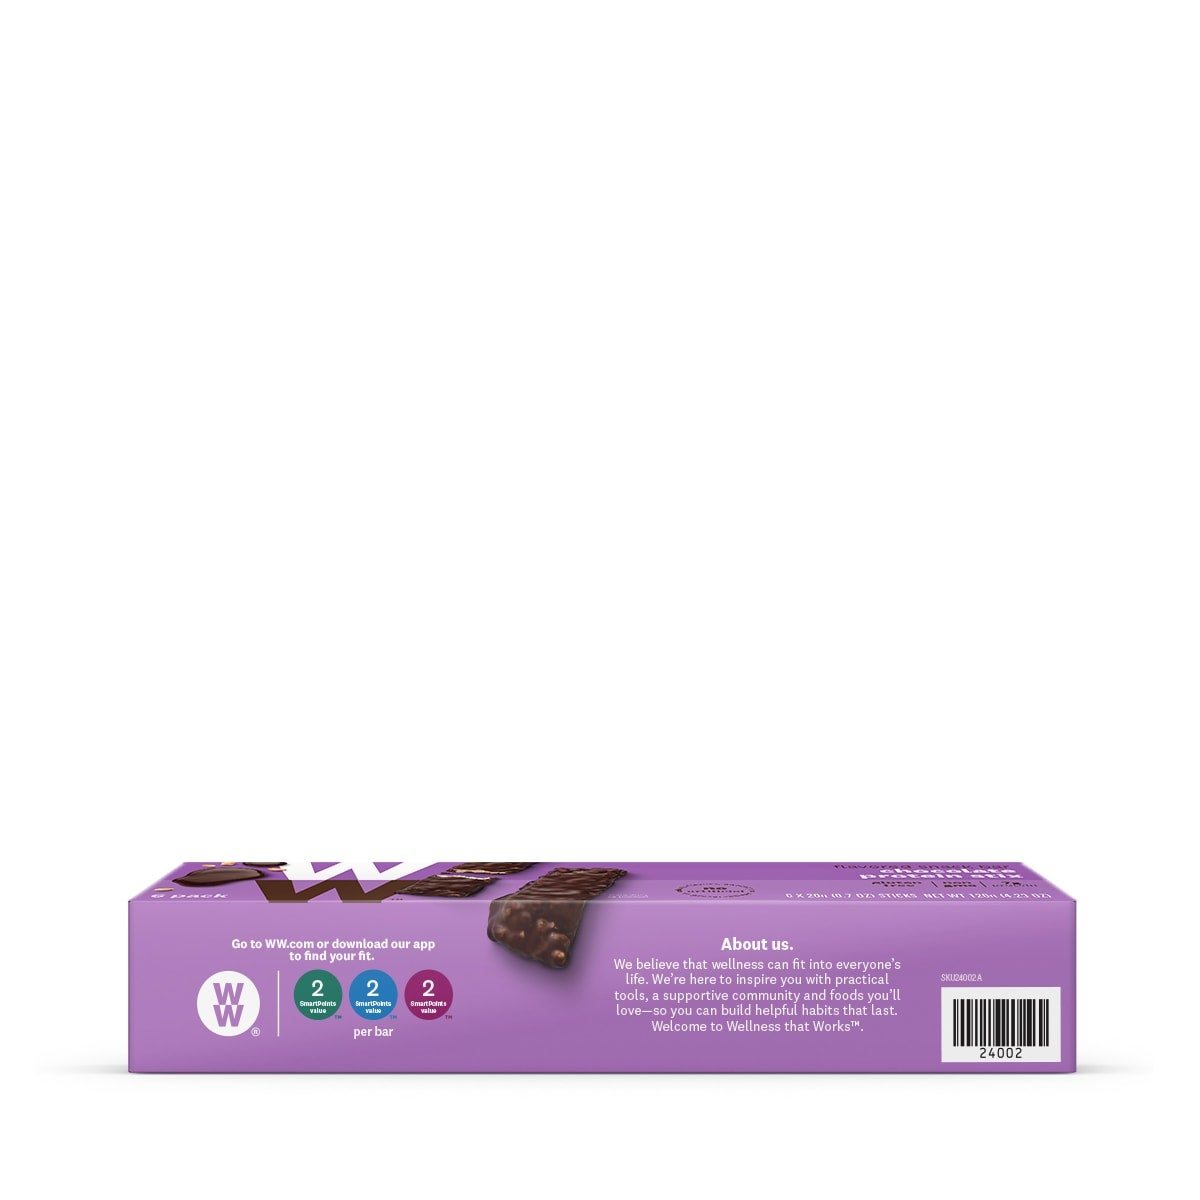 Chocolate Protein Stix - side of box